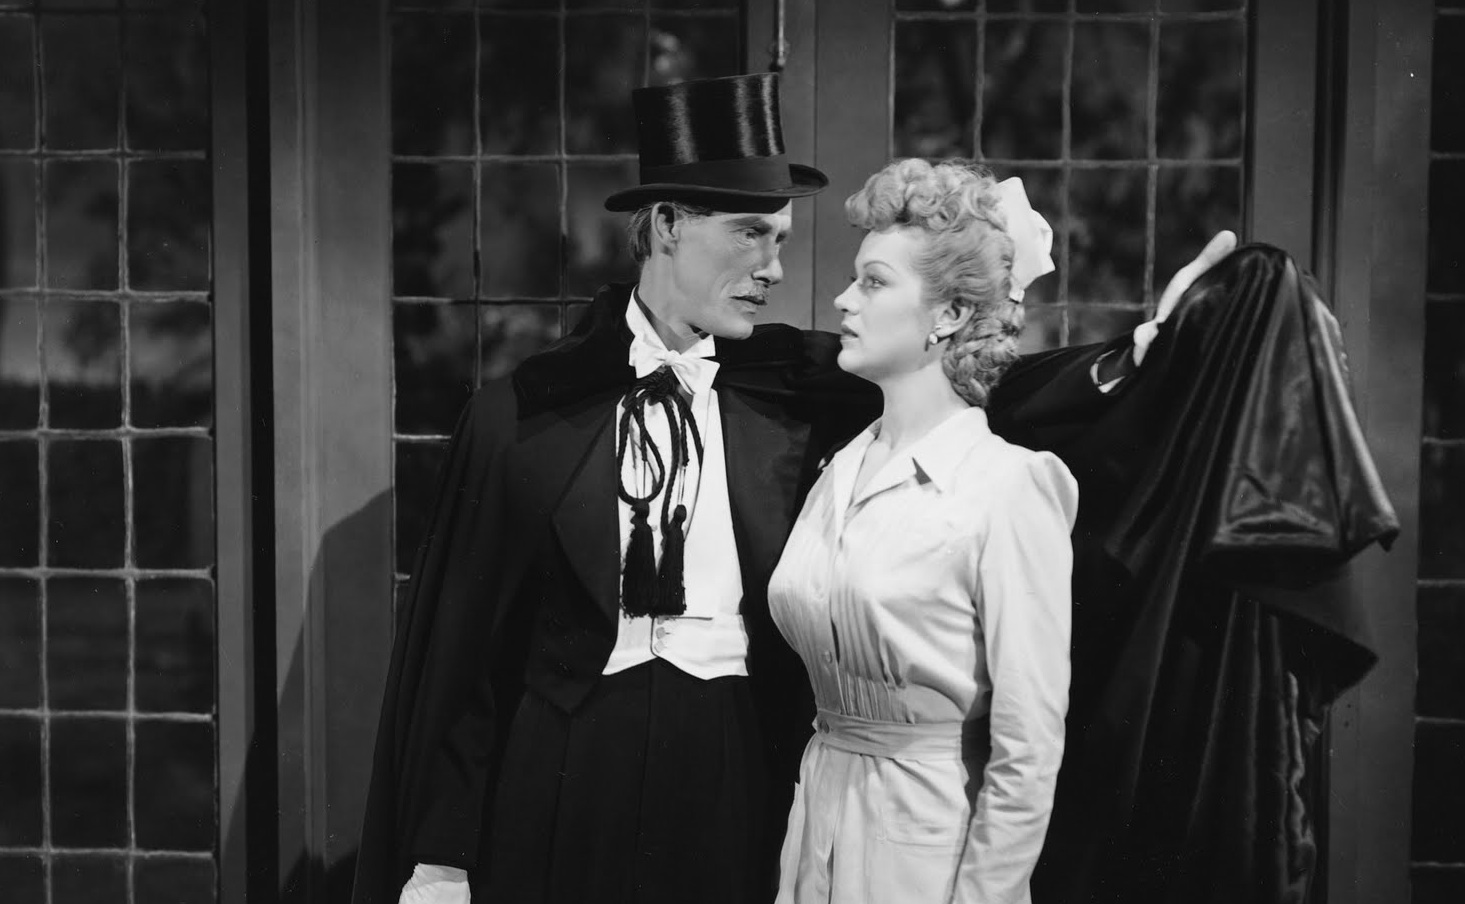 Dracula (John Carradine) makes the moves on nurse Martha O'Driscoll in House of Dracula (1945)